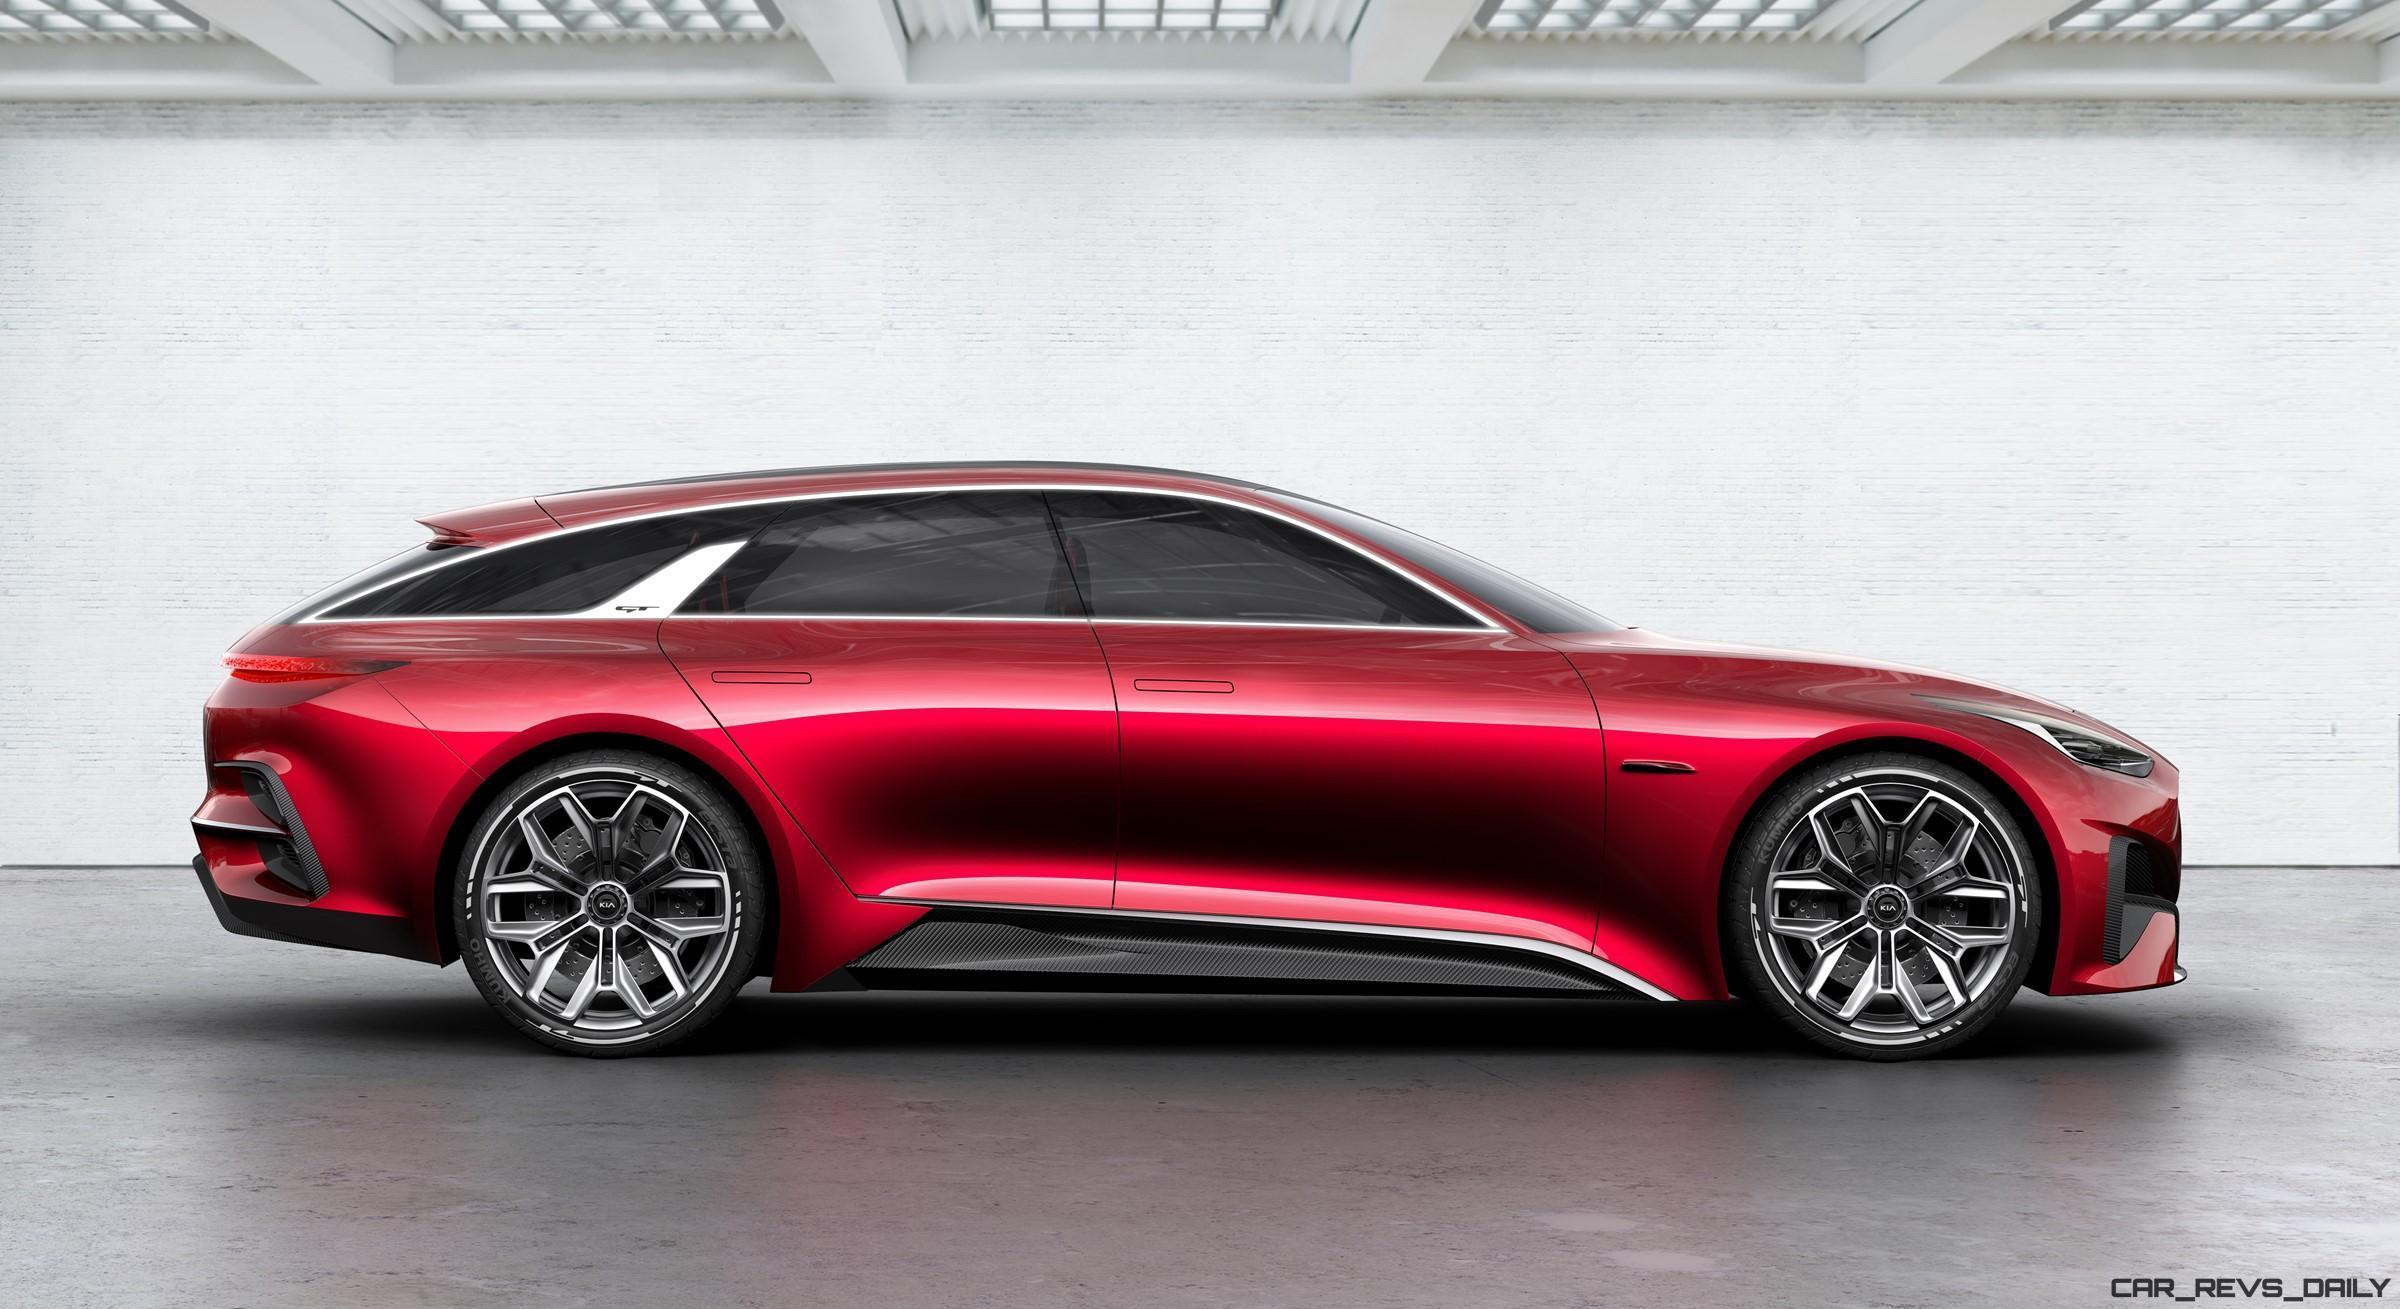 Luxury Sports Cars >> 2017 KIA Proceed Concept Brings Hot-Wagon Style to Frankfurt